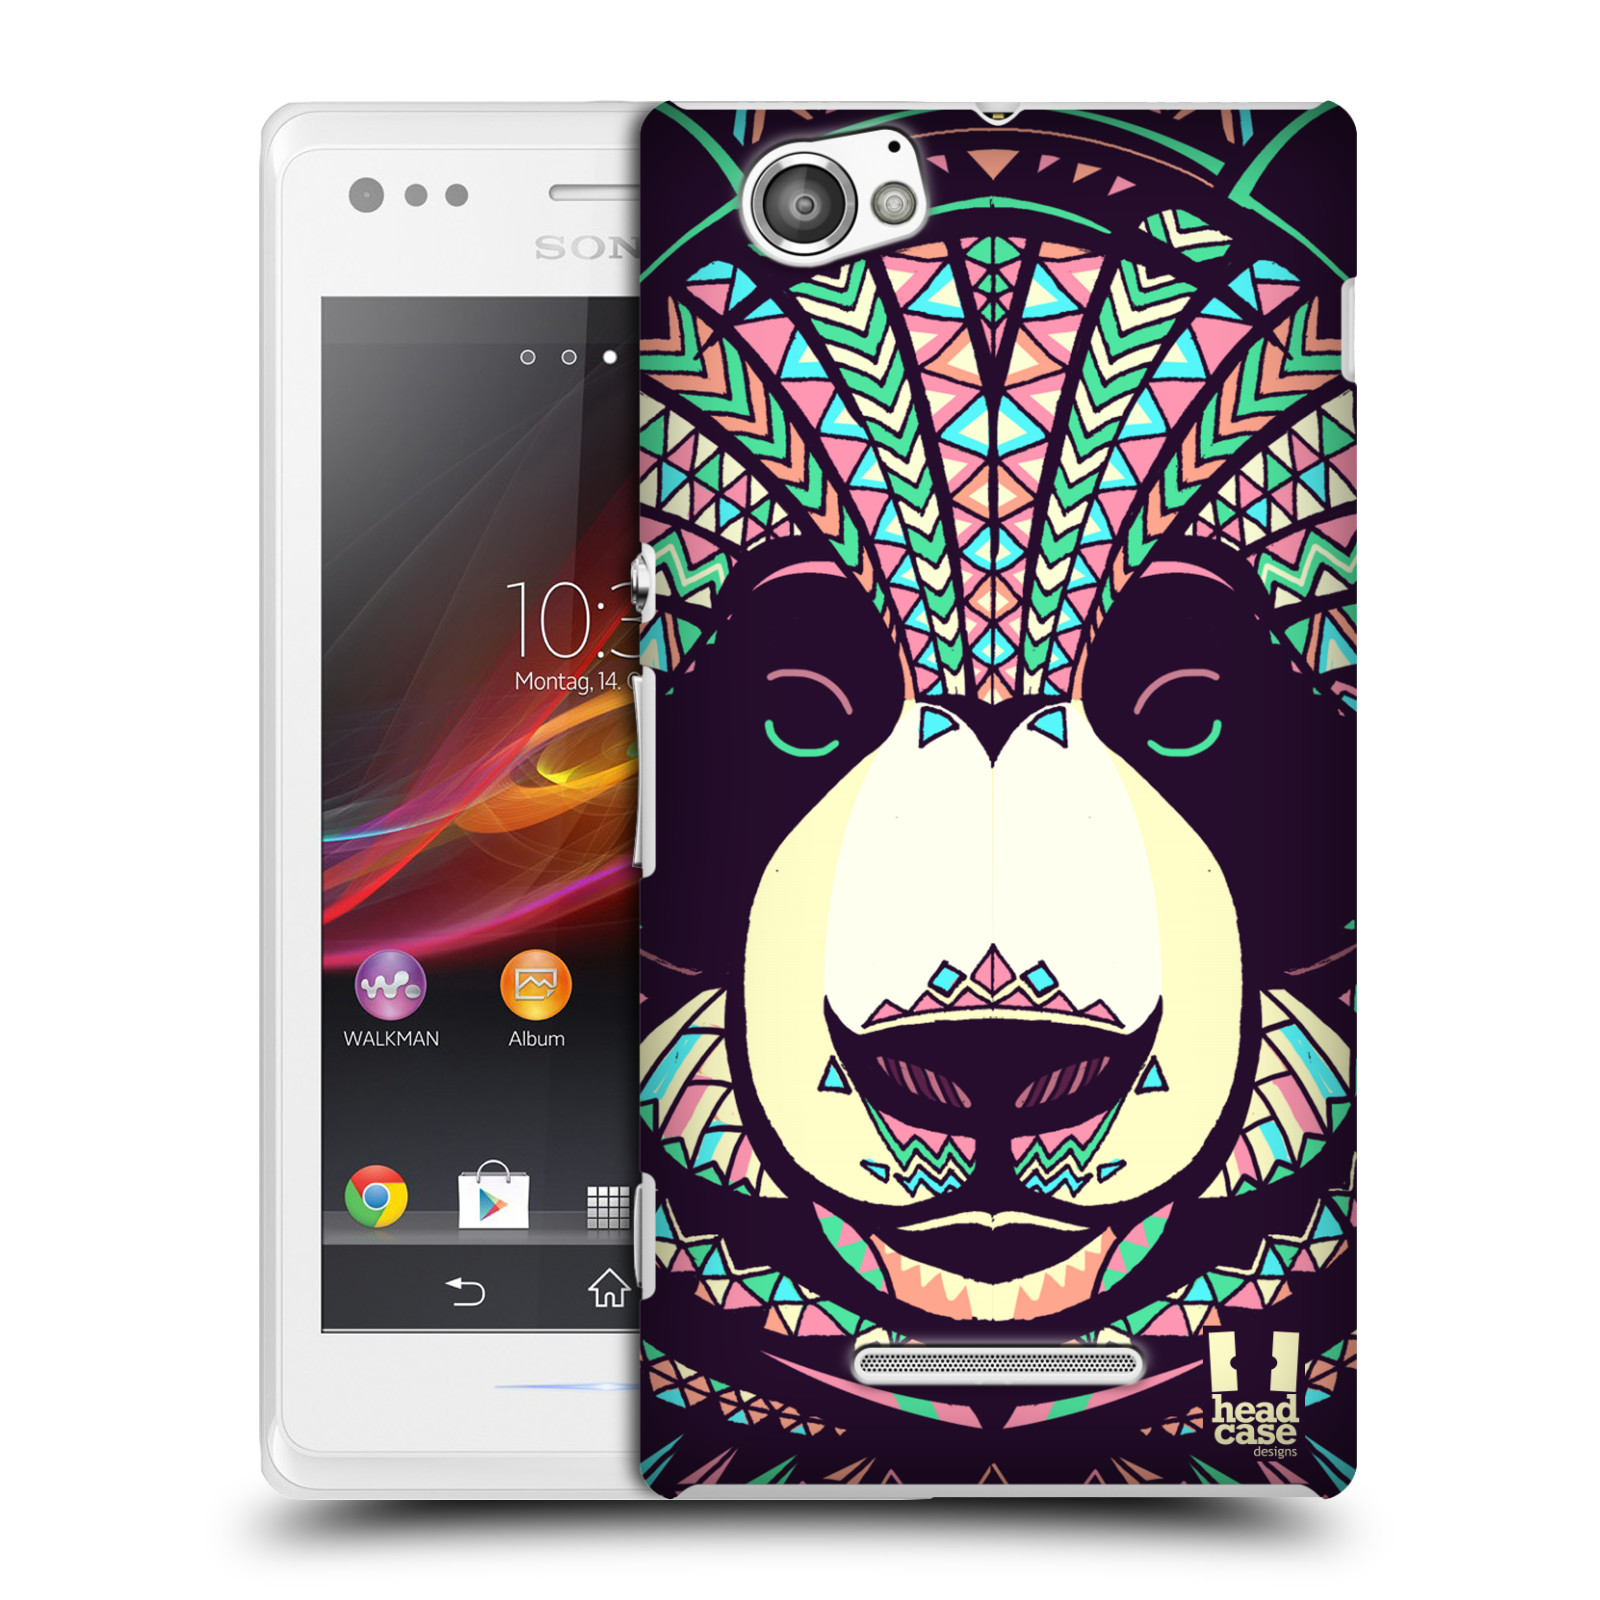 HEAD CASE plastový obal na mobil Sony Xperia M vzor Aztécký motiv zvíře 3 panda